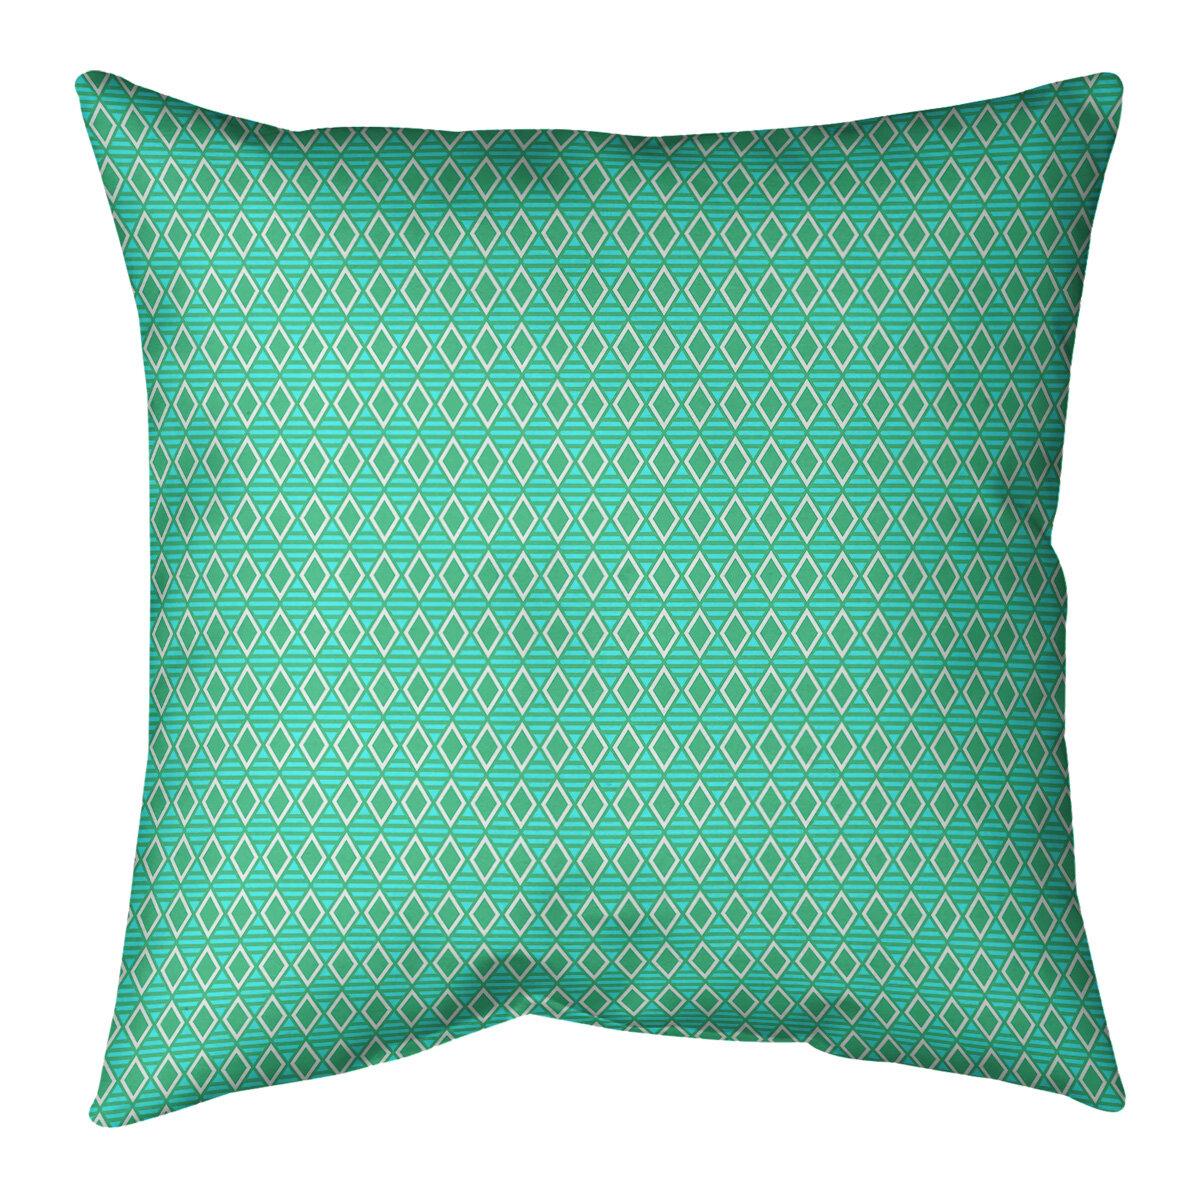 East Urban Home Mcguigan Geometric Diamonds Throw Pillow Wayfair